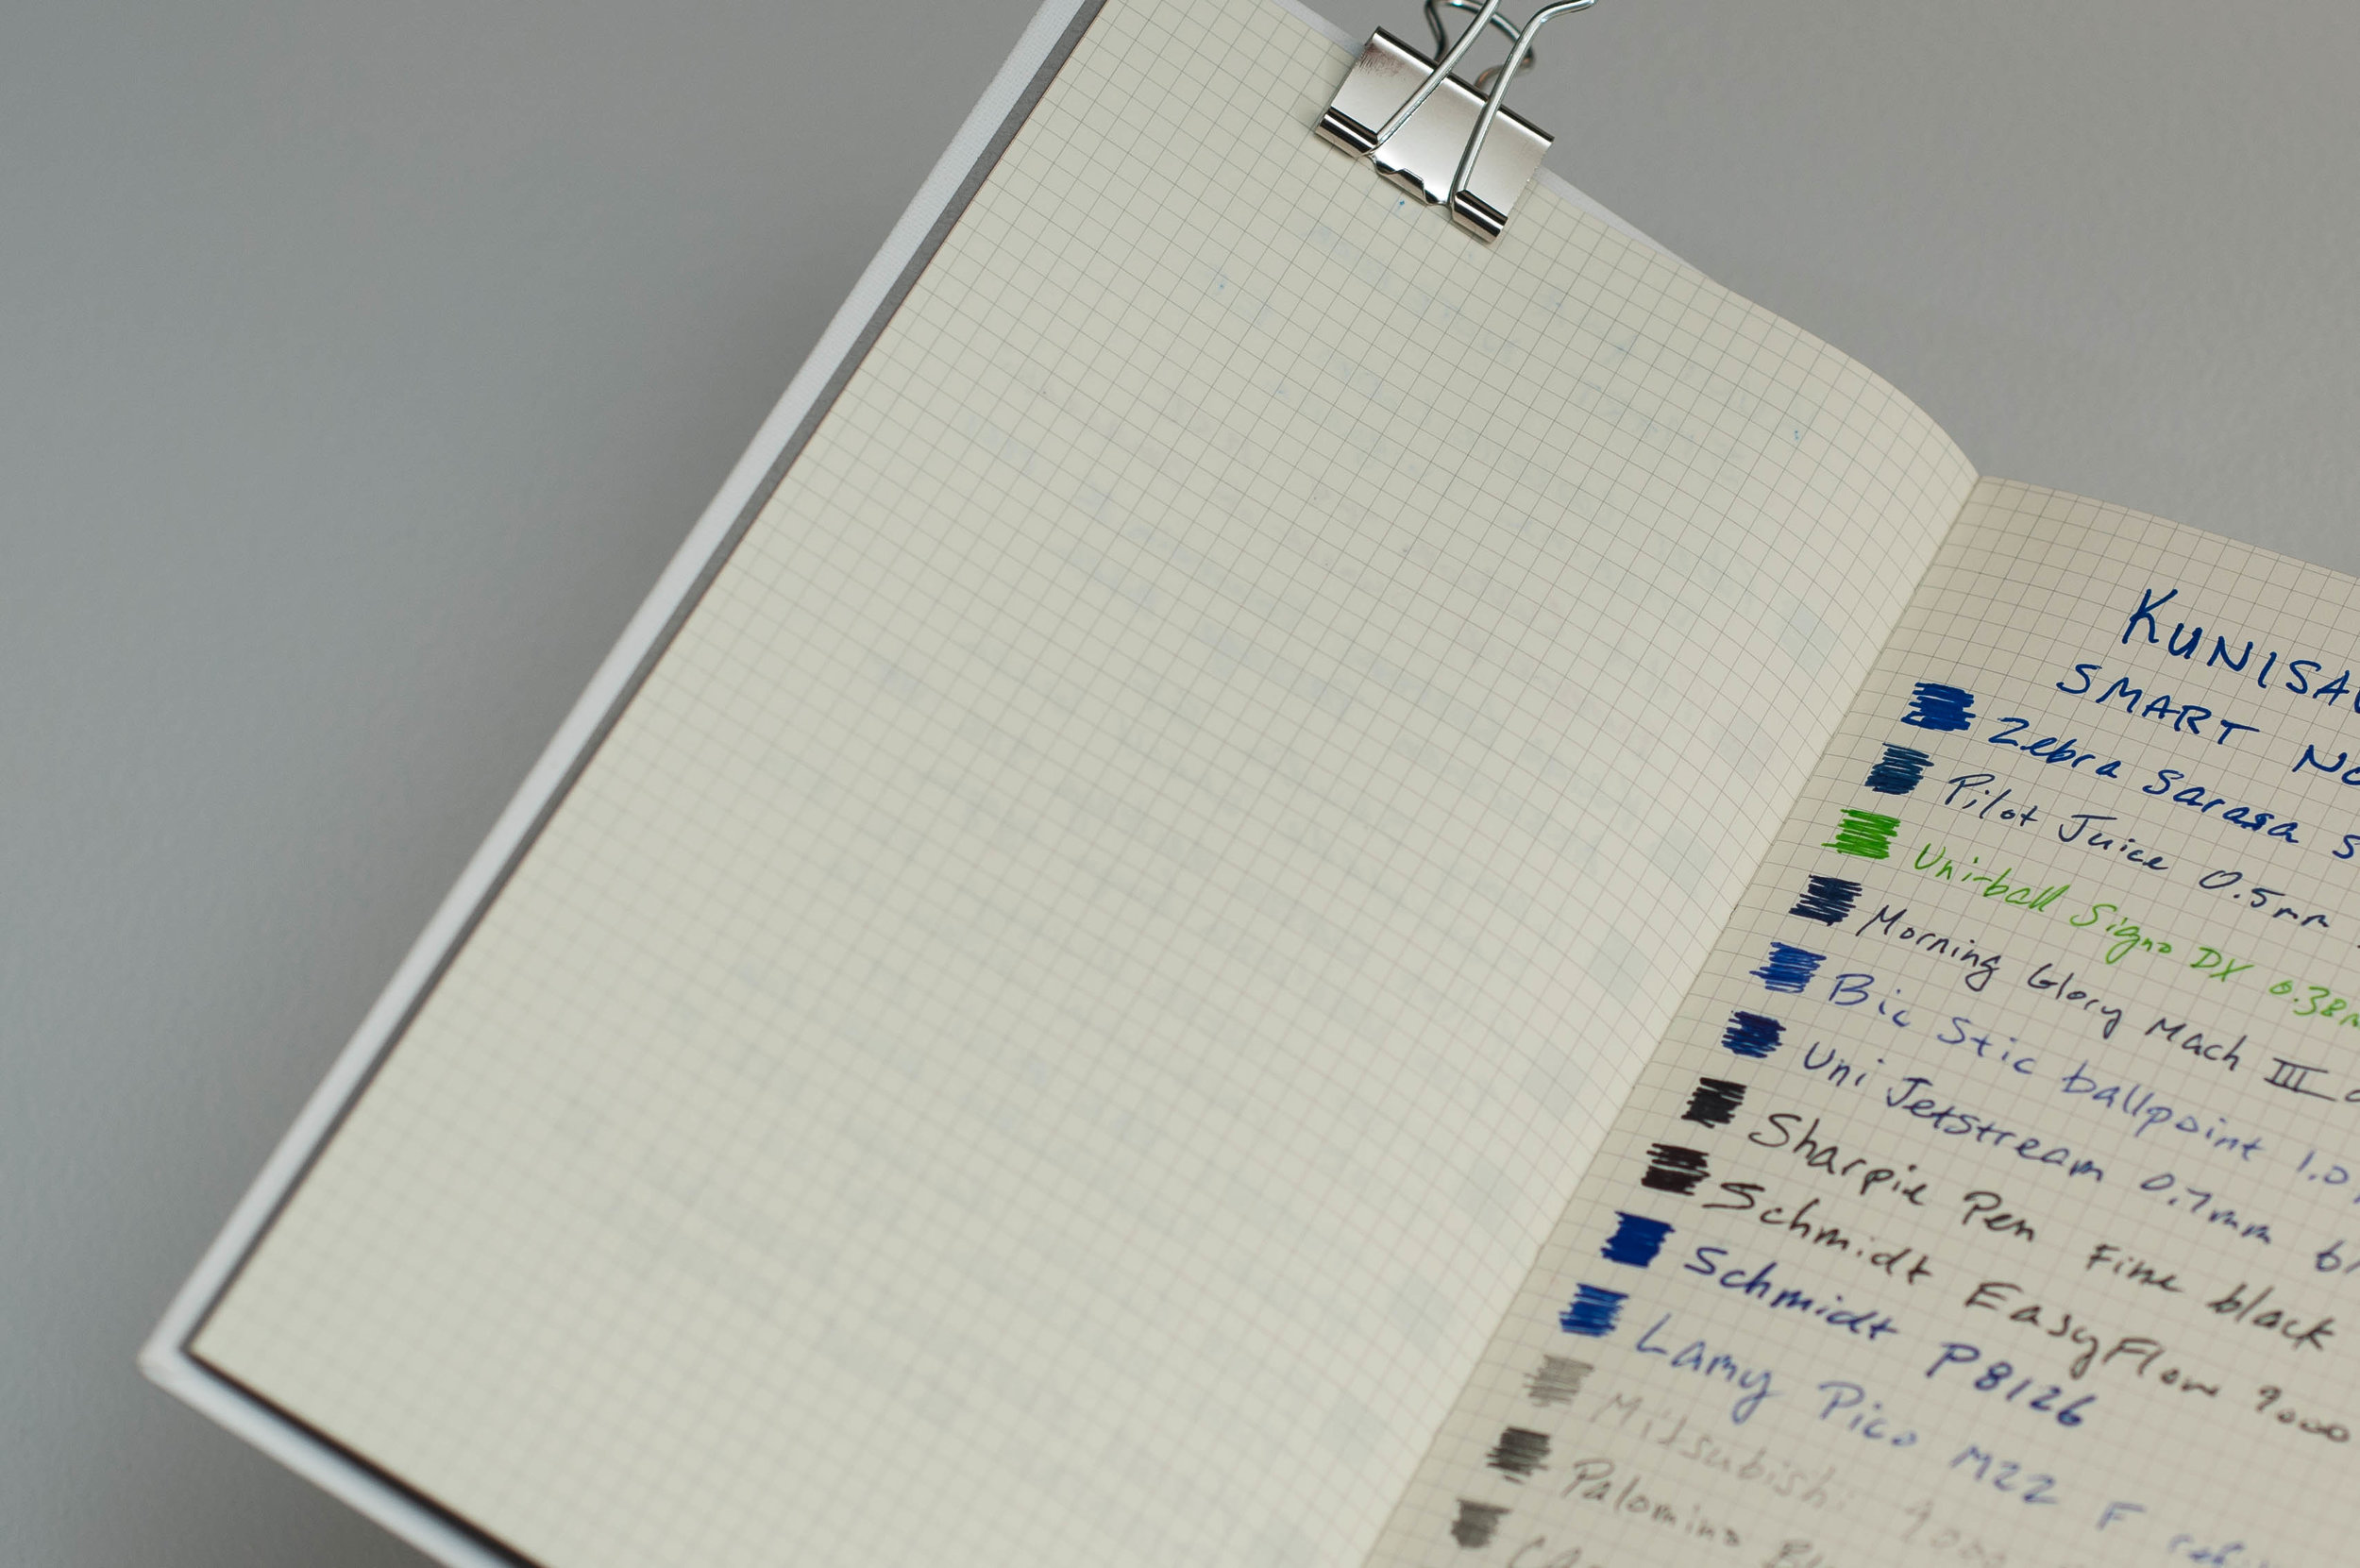 Kunisawa Find Smart Notebook Paper